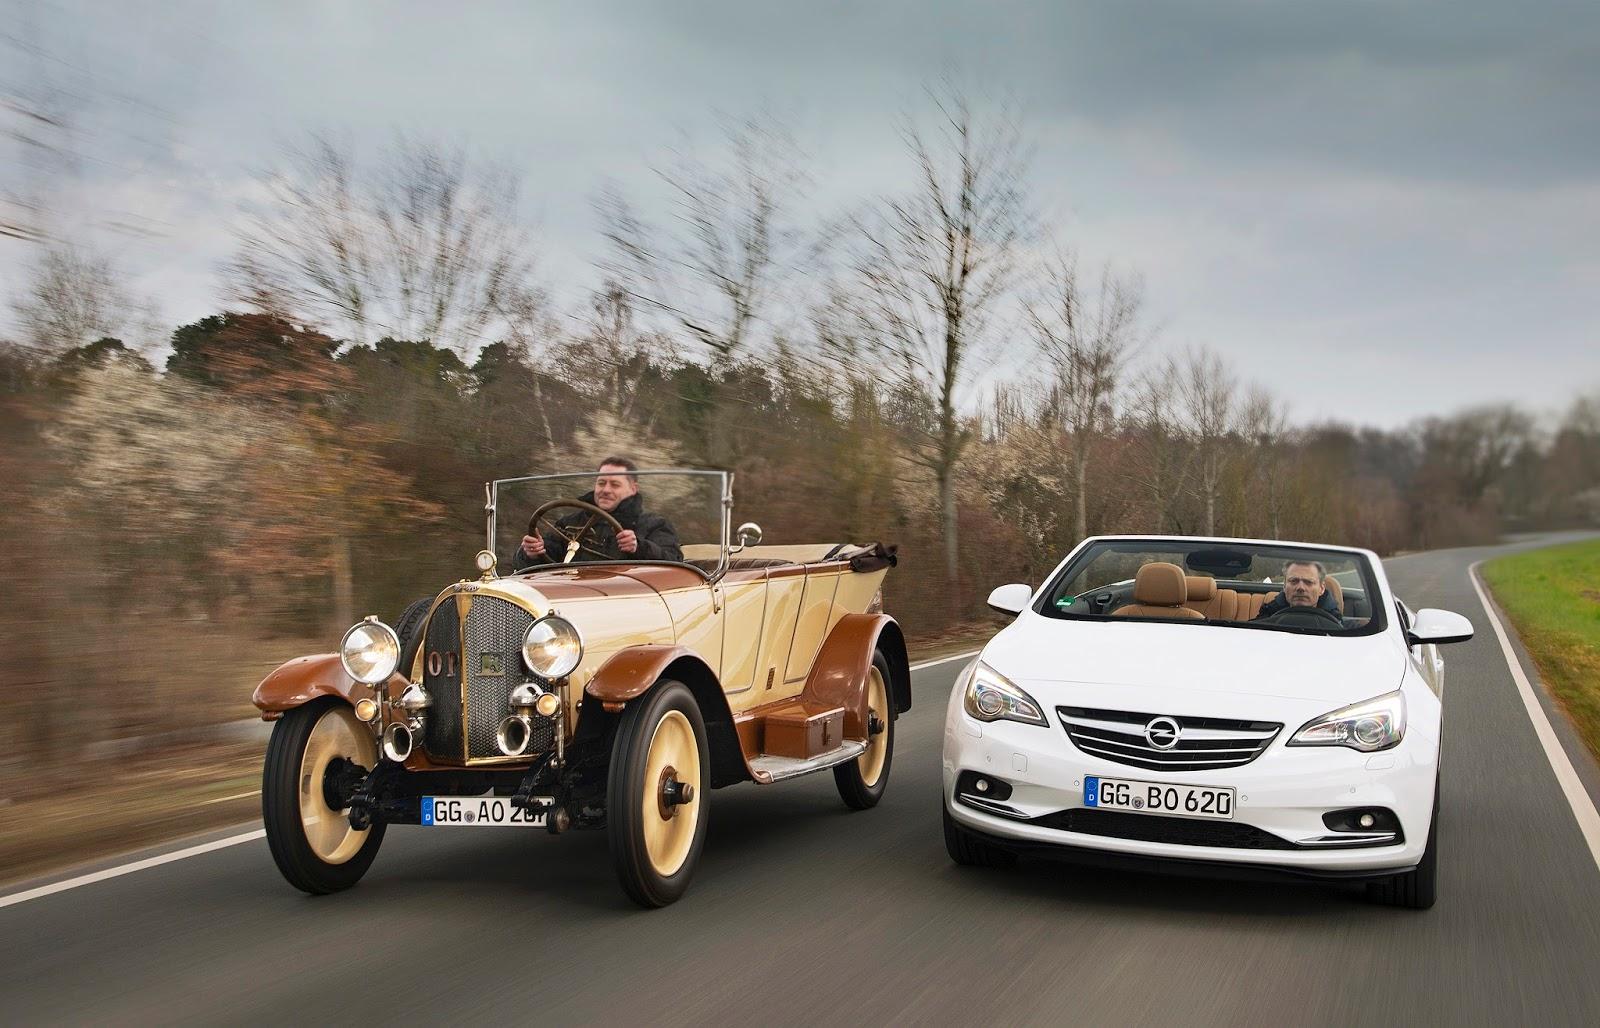 Opel Rallye Hessen Th25C325BCringen 301005 H Πλούσια Κληρονομιά των Opel Cabrio cabrio, Opel, Opel 8/25 hp, Opel Cascada, Opel Olympia, Opel Record, Opel Super 6